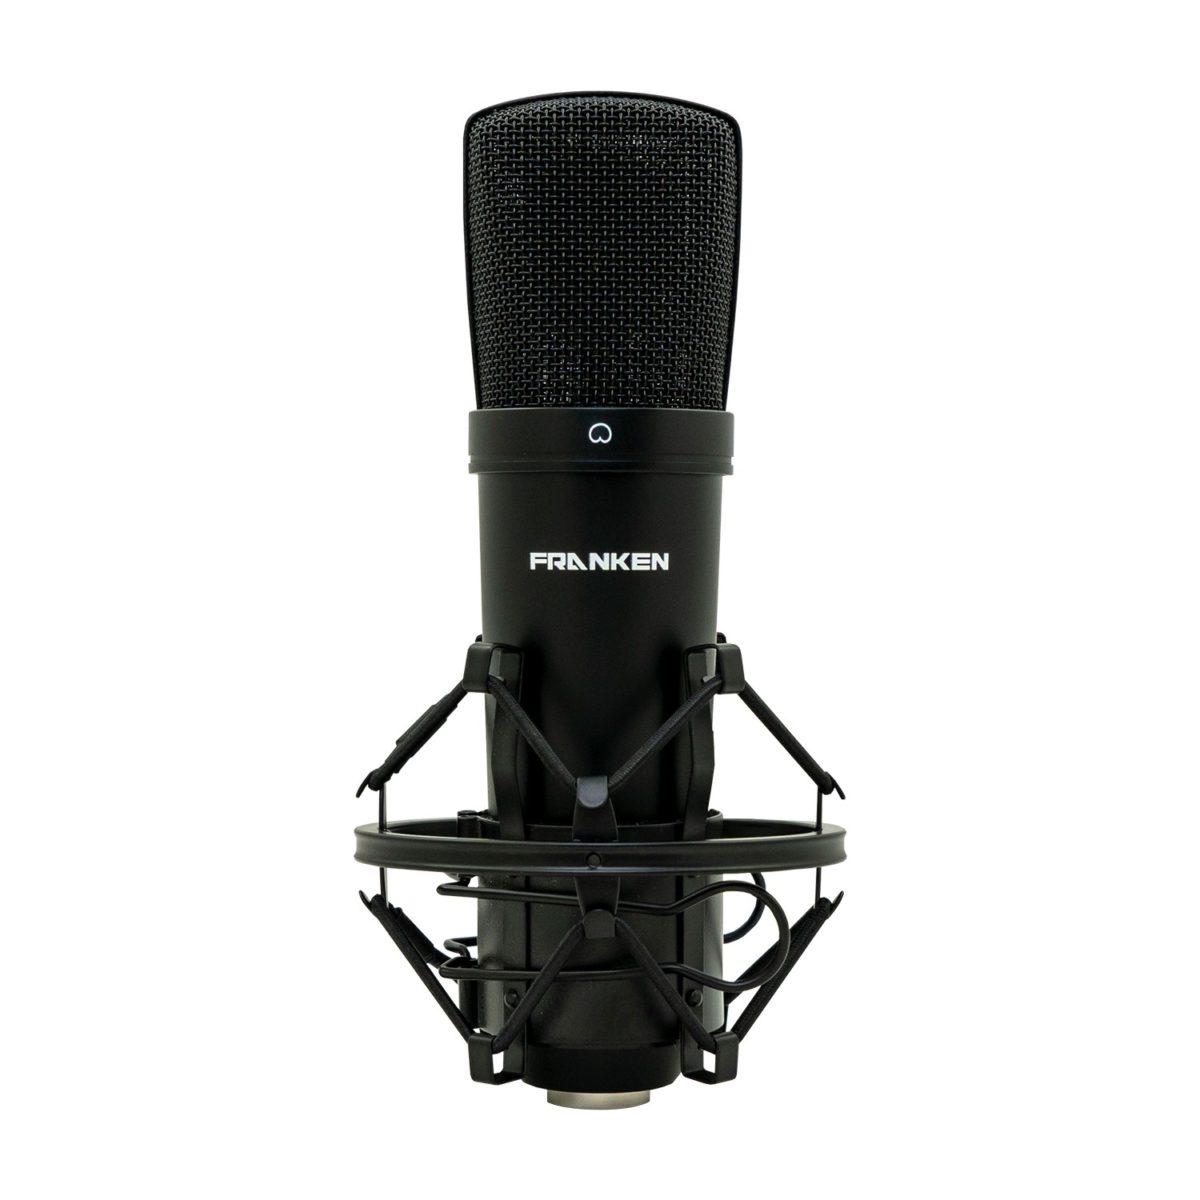 Franken SM-1 Studio Condenser Microphone ไมโครโฟนอัดเสียงสตูดิโอ